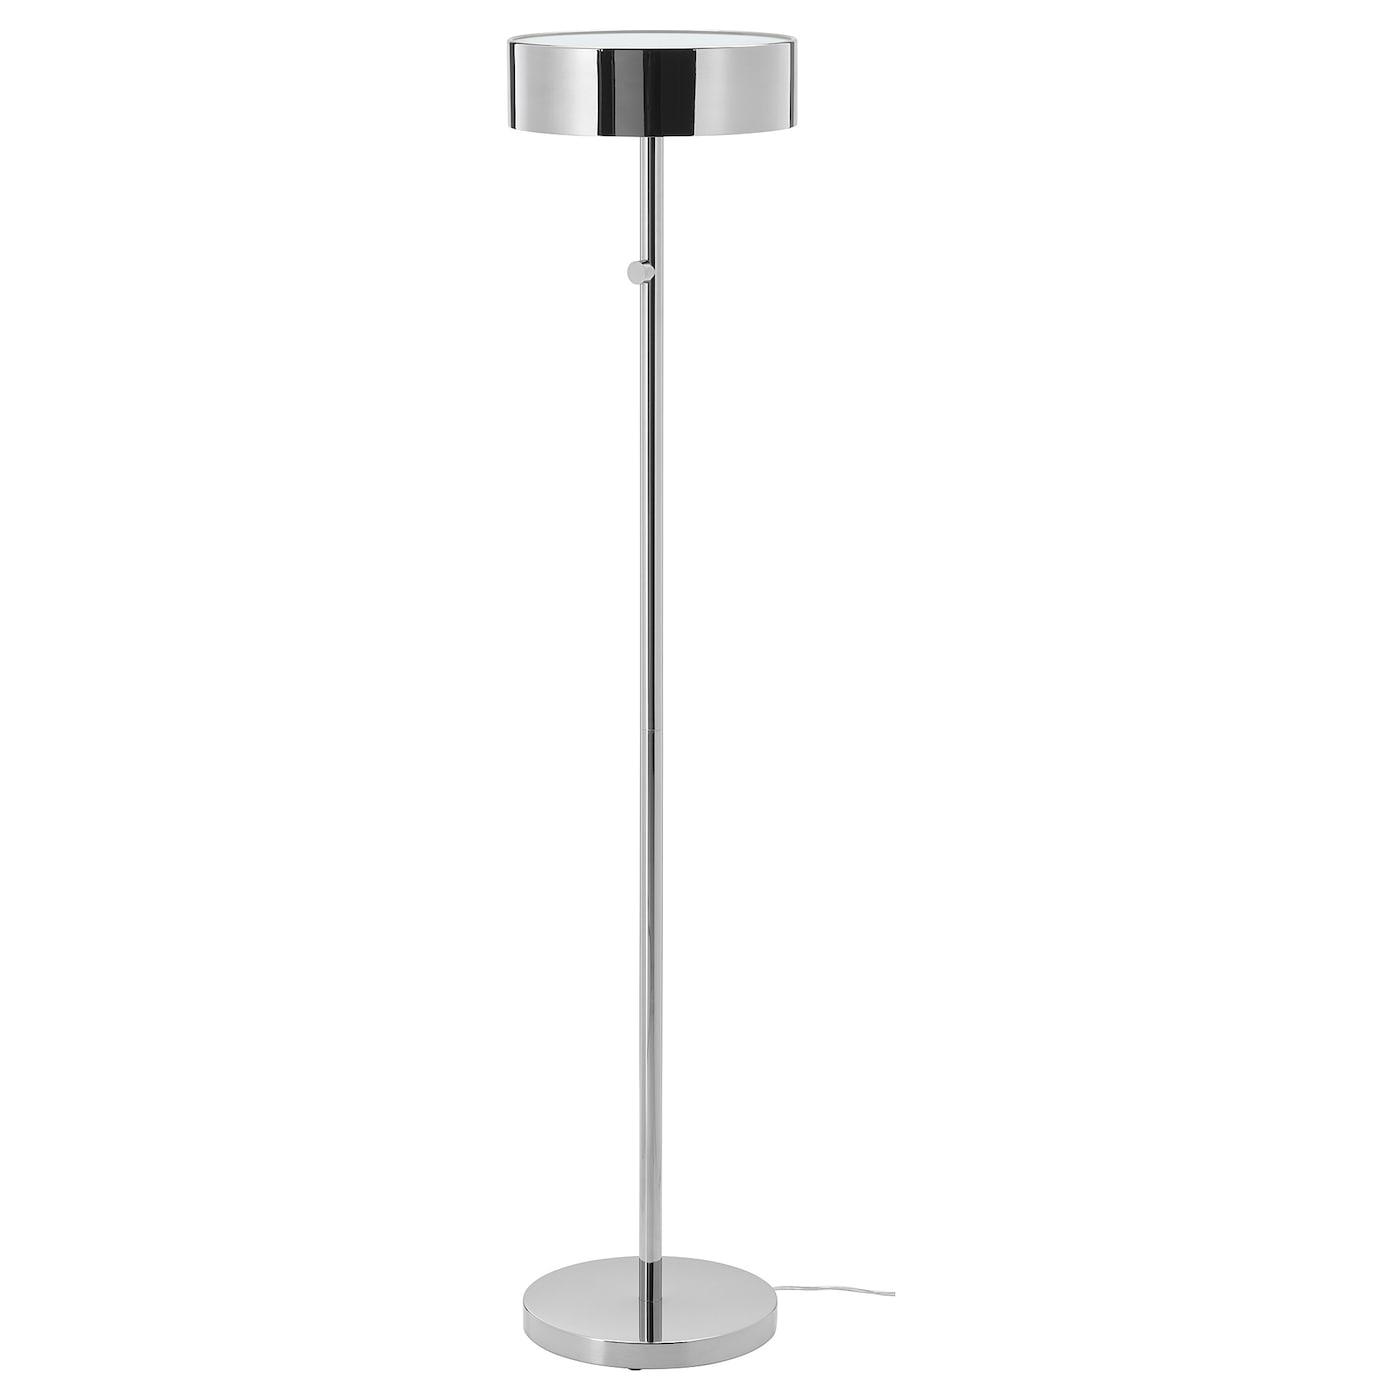 Cucine Ikea 2017 Prezzi stockholm 2017 lampada da terra - cromato